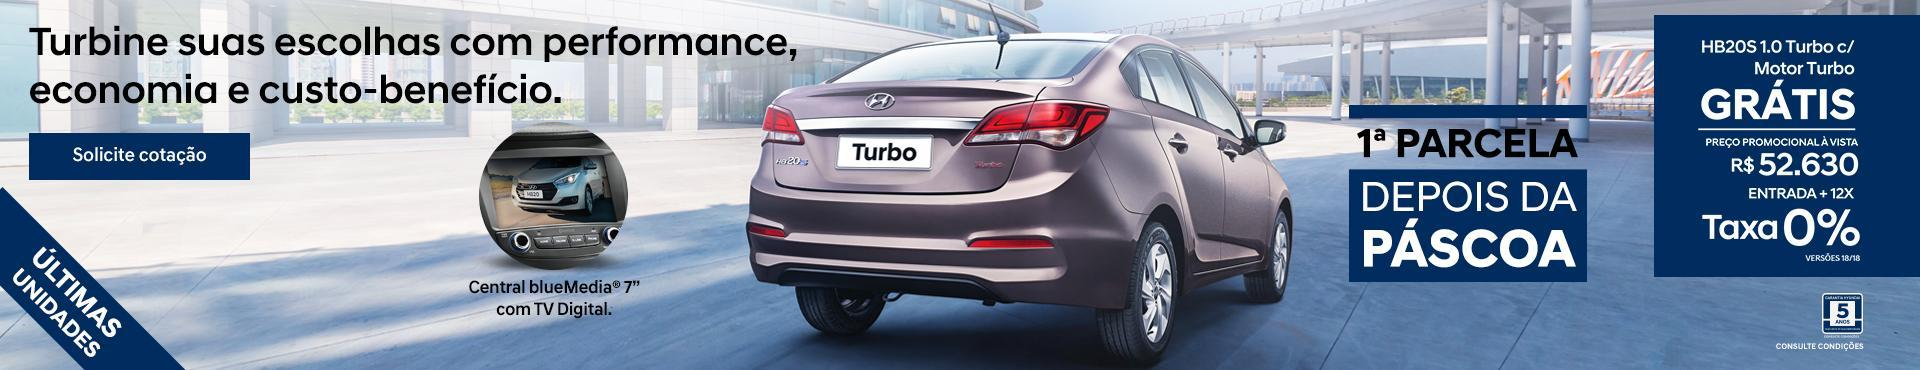 turbo gratis